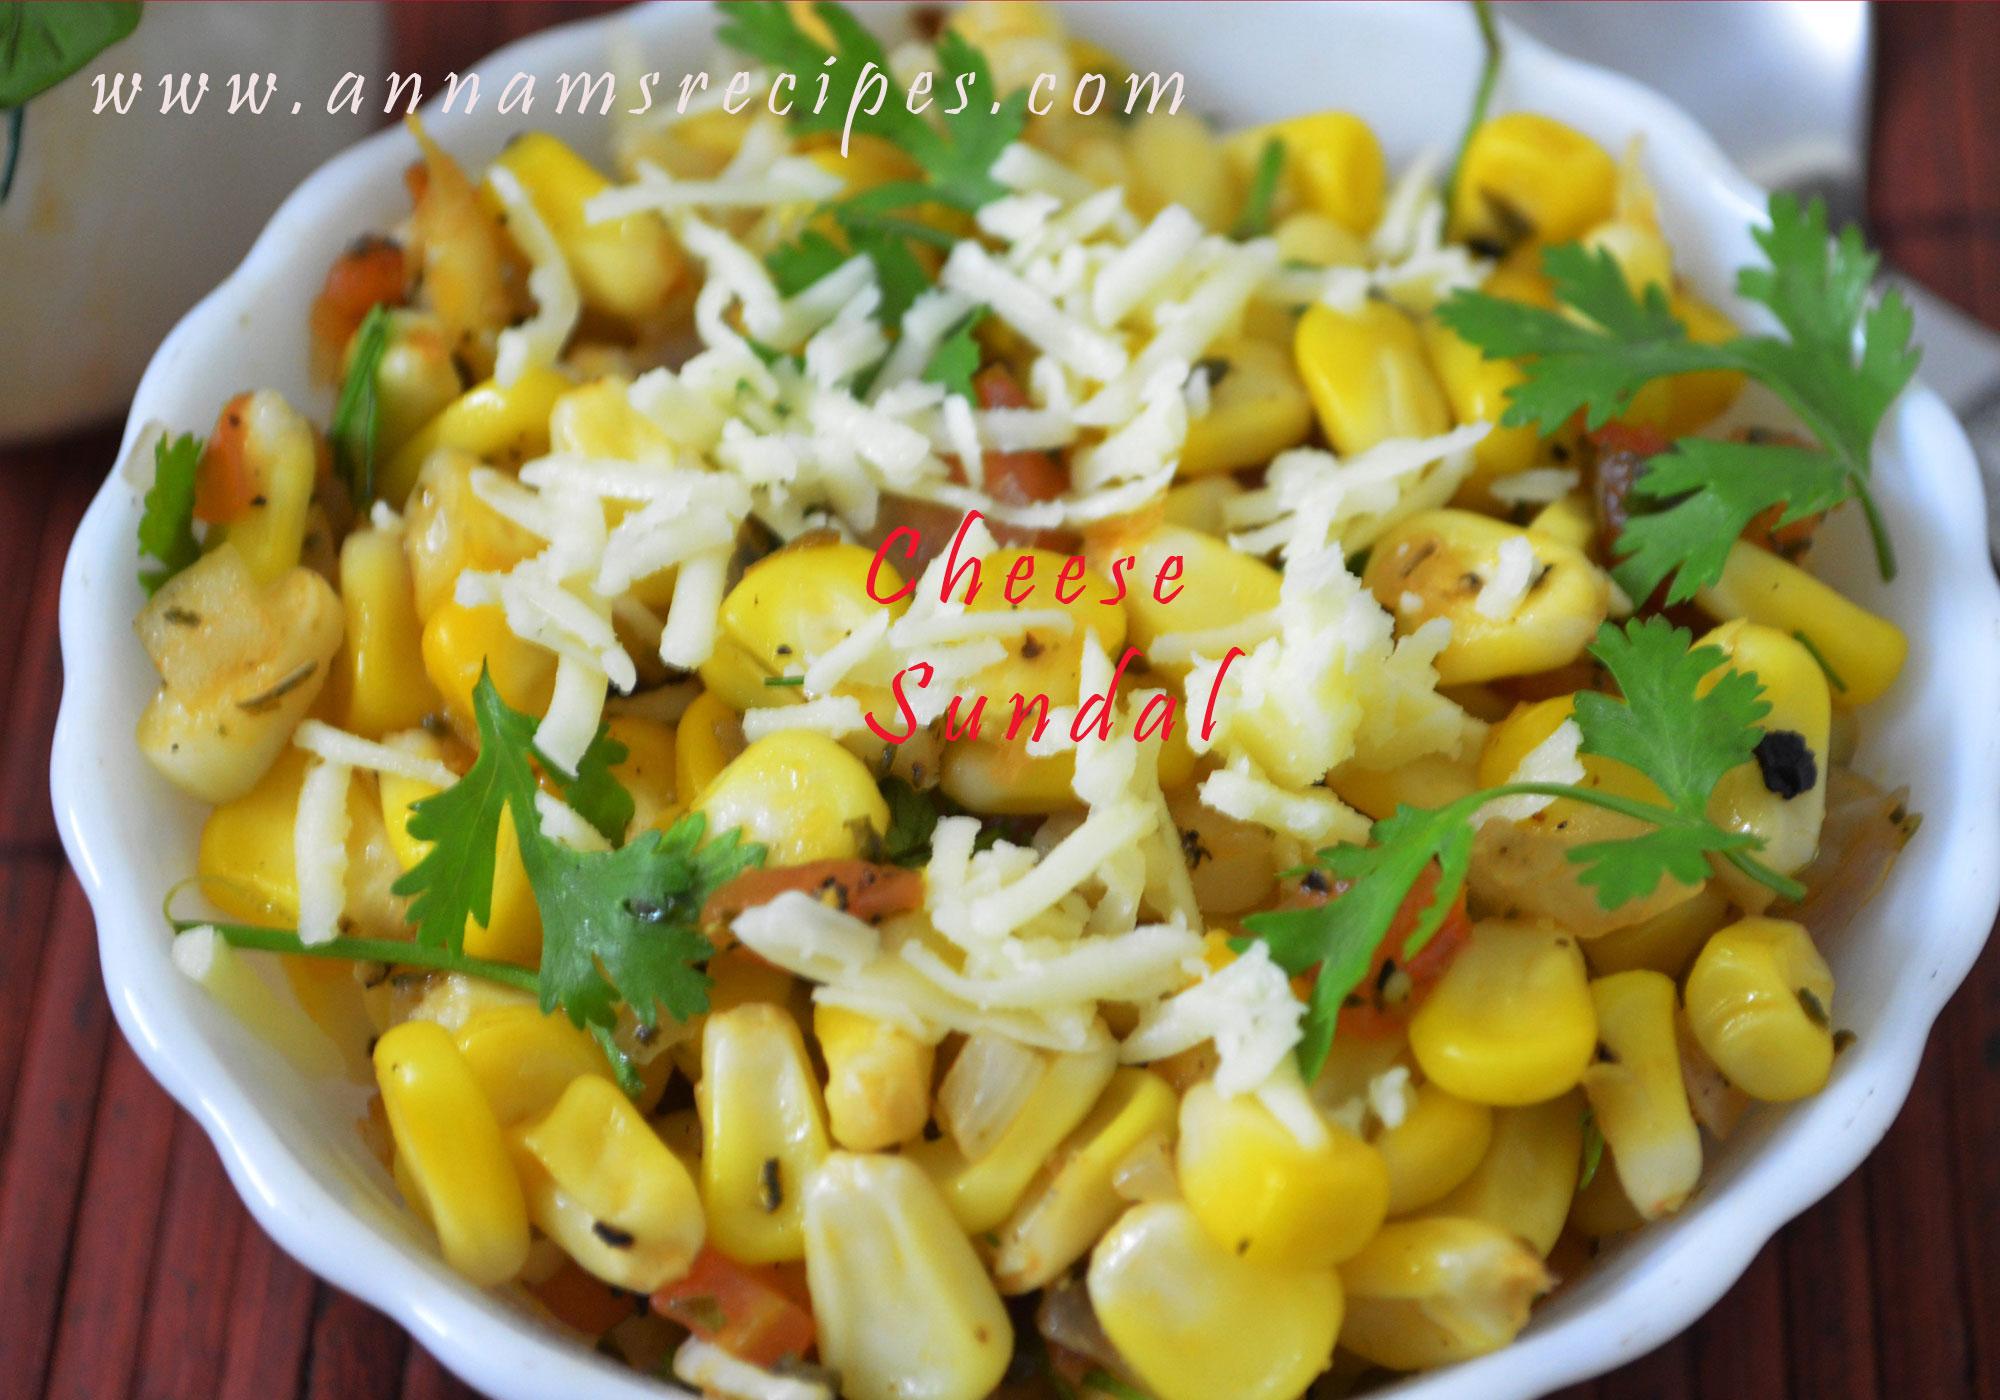 Sweet Corn Cheese Sundal